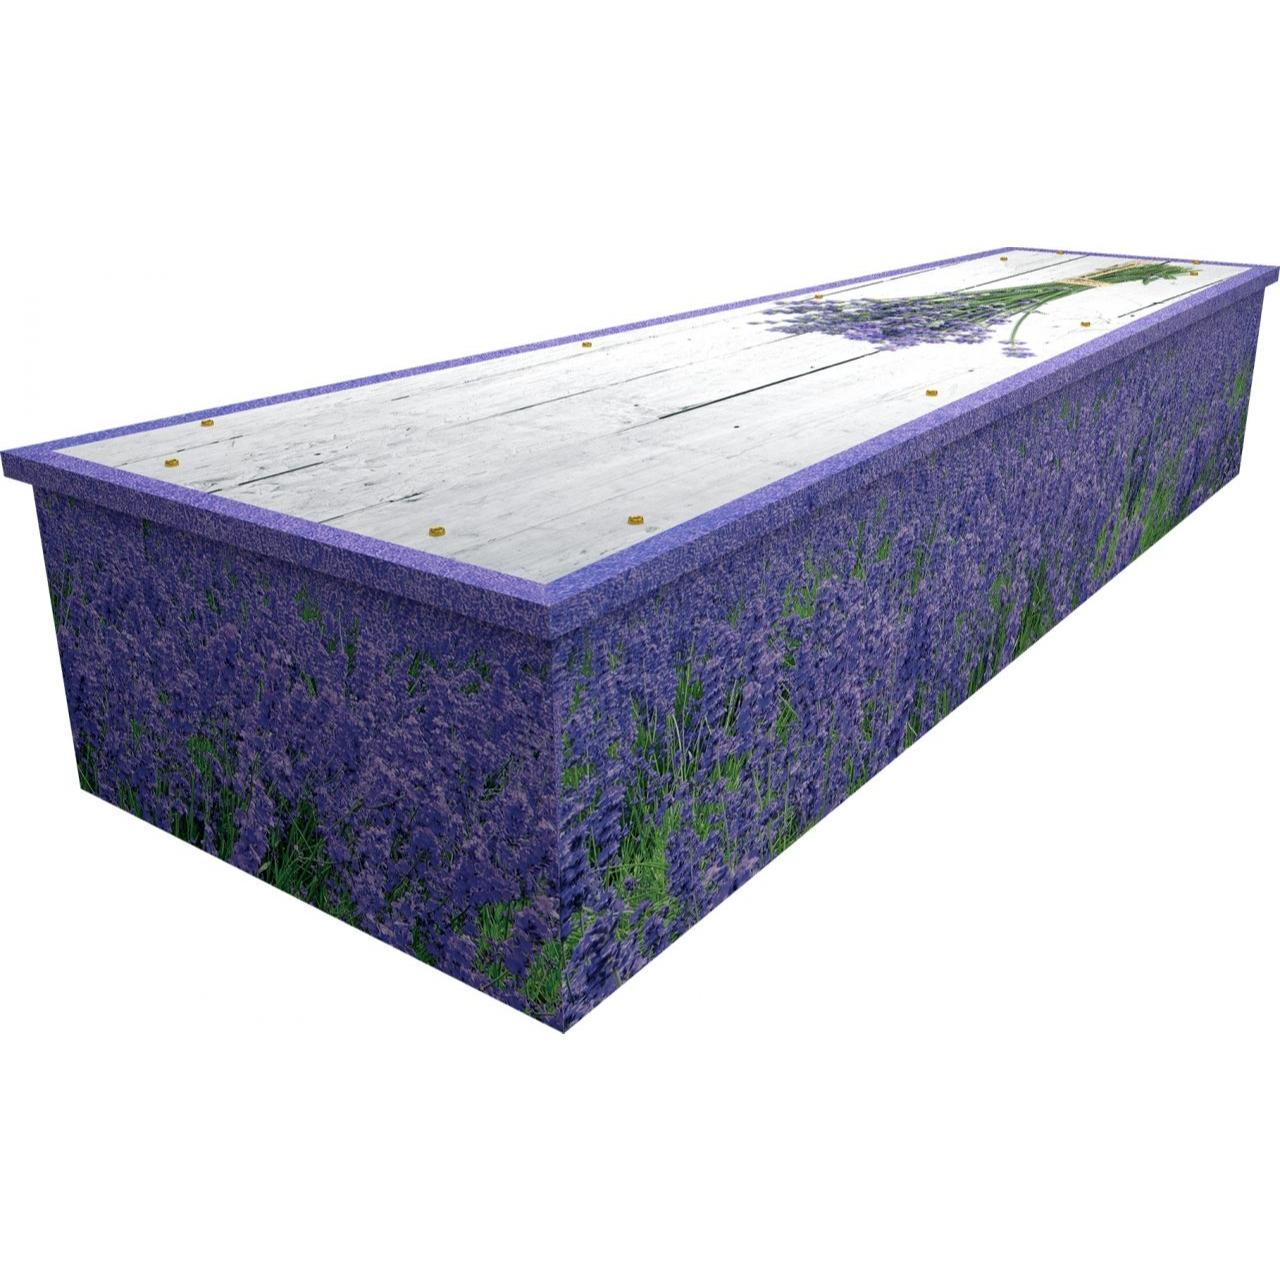 Lavender Cardboard Coffin